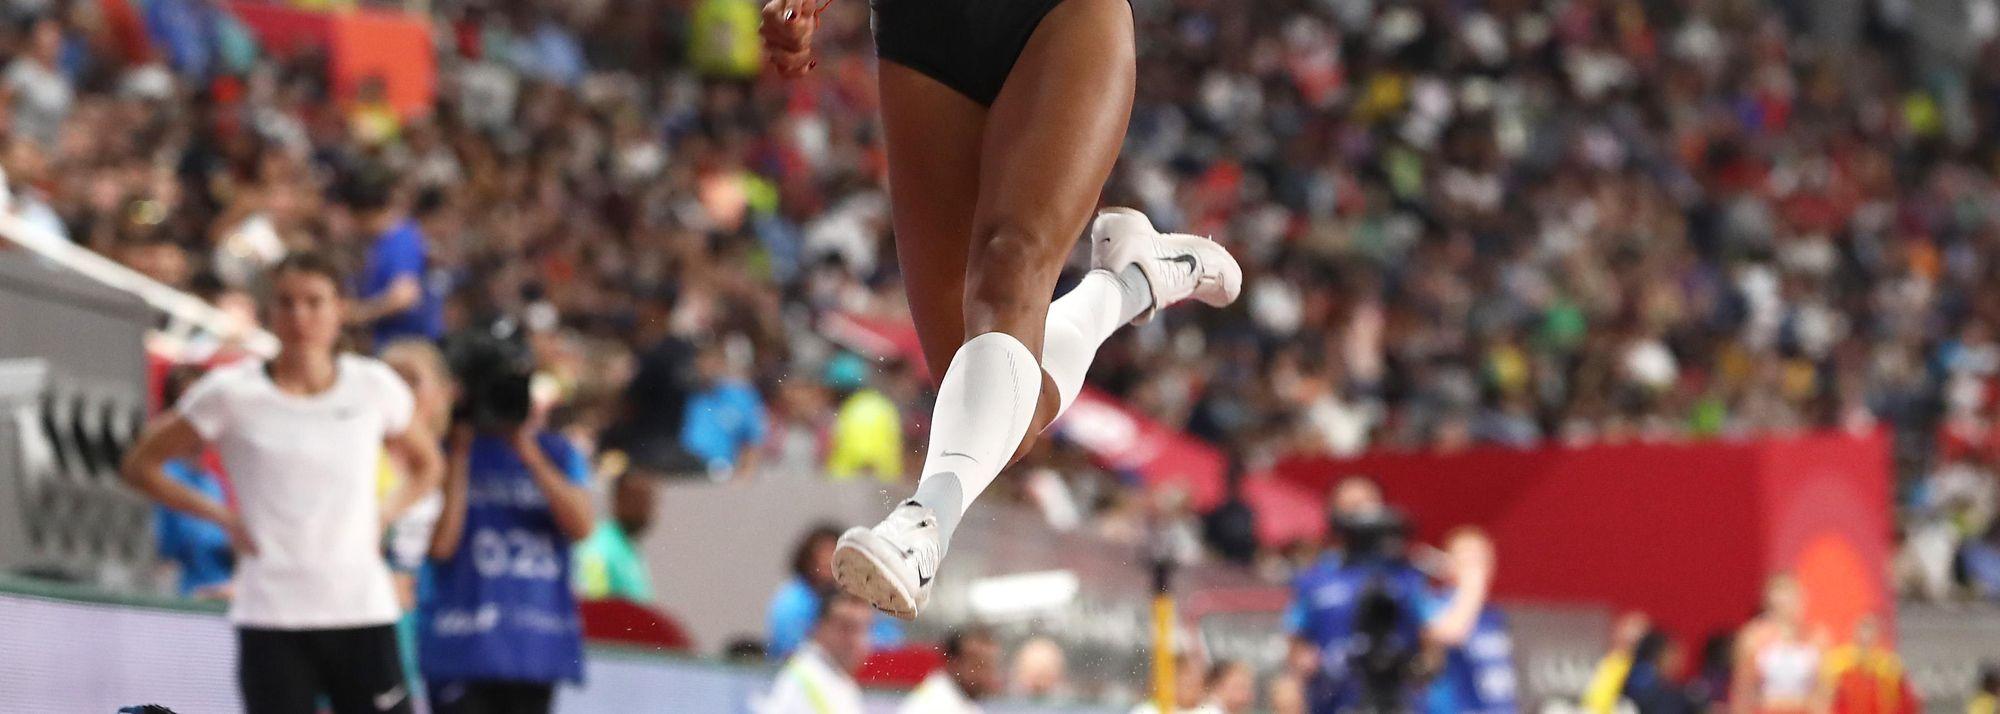 In the third round of the long jump at the IAAF World Athletics Championships Doha 2019, Malaika Mihambo's dreams almost came crashing down.